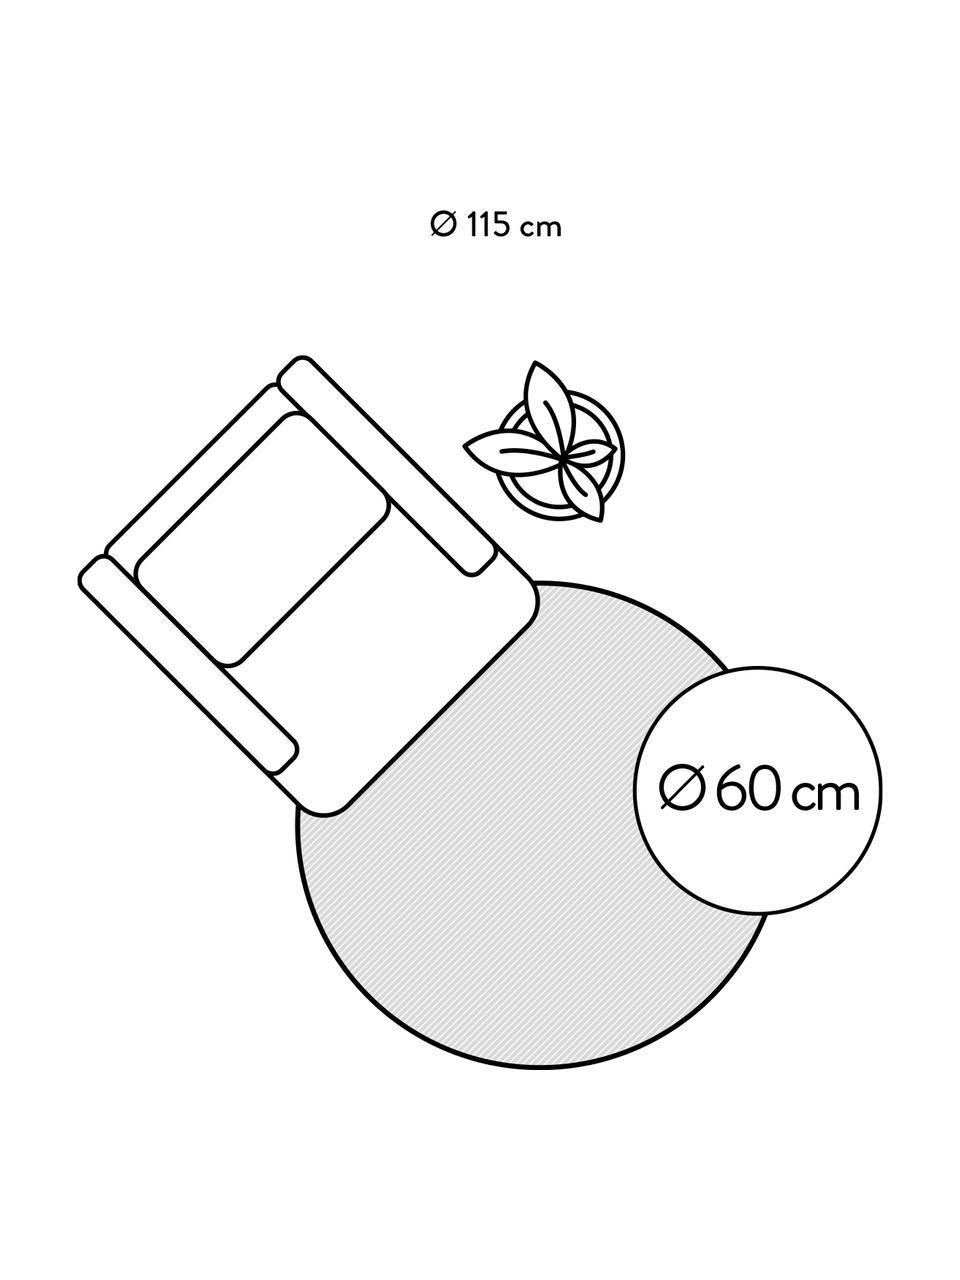 Runder Viskoseteppich Jane in Dunkelblau, handgewebt, Flor: 100% Viskose, Dunkelblau, Ø 200 cm (Größe L)